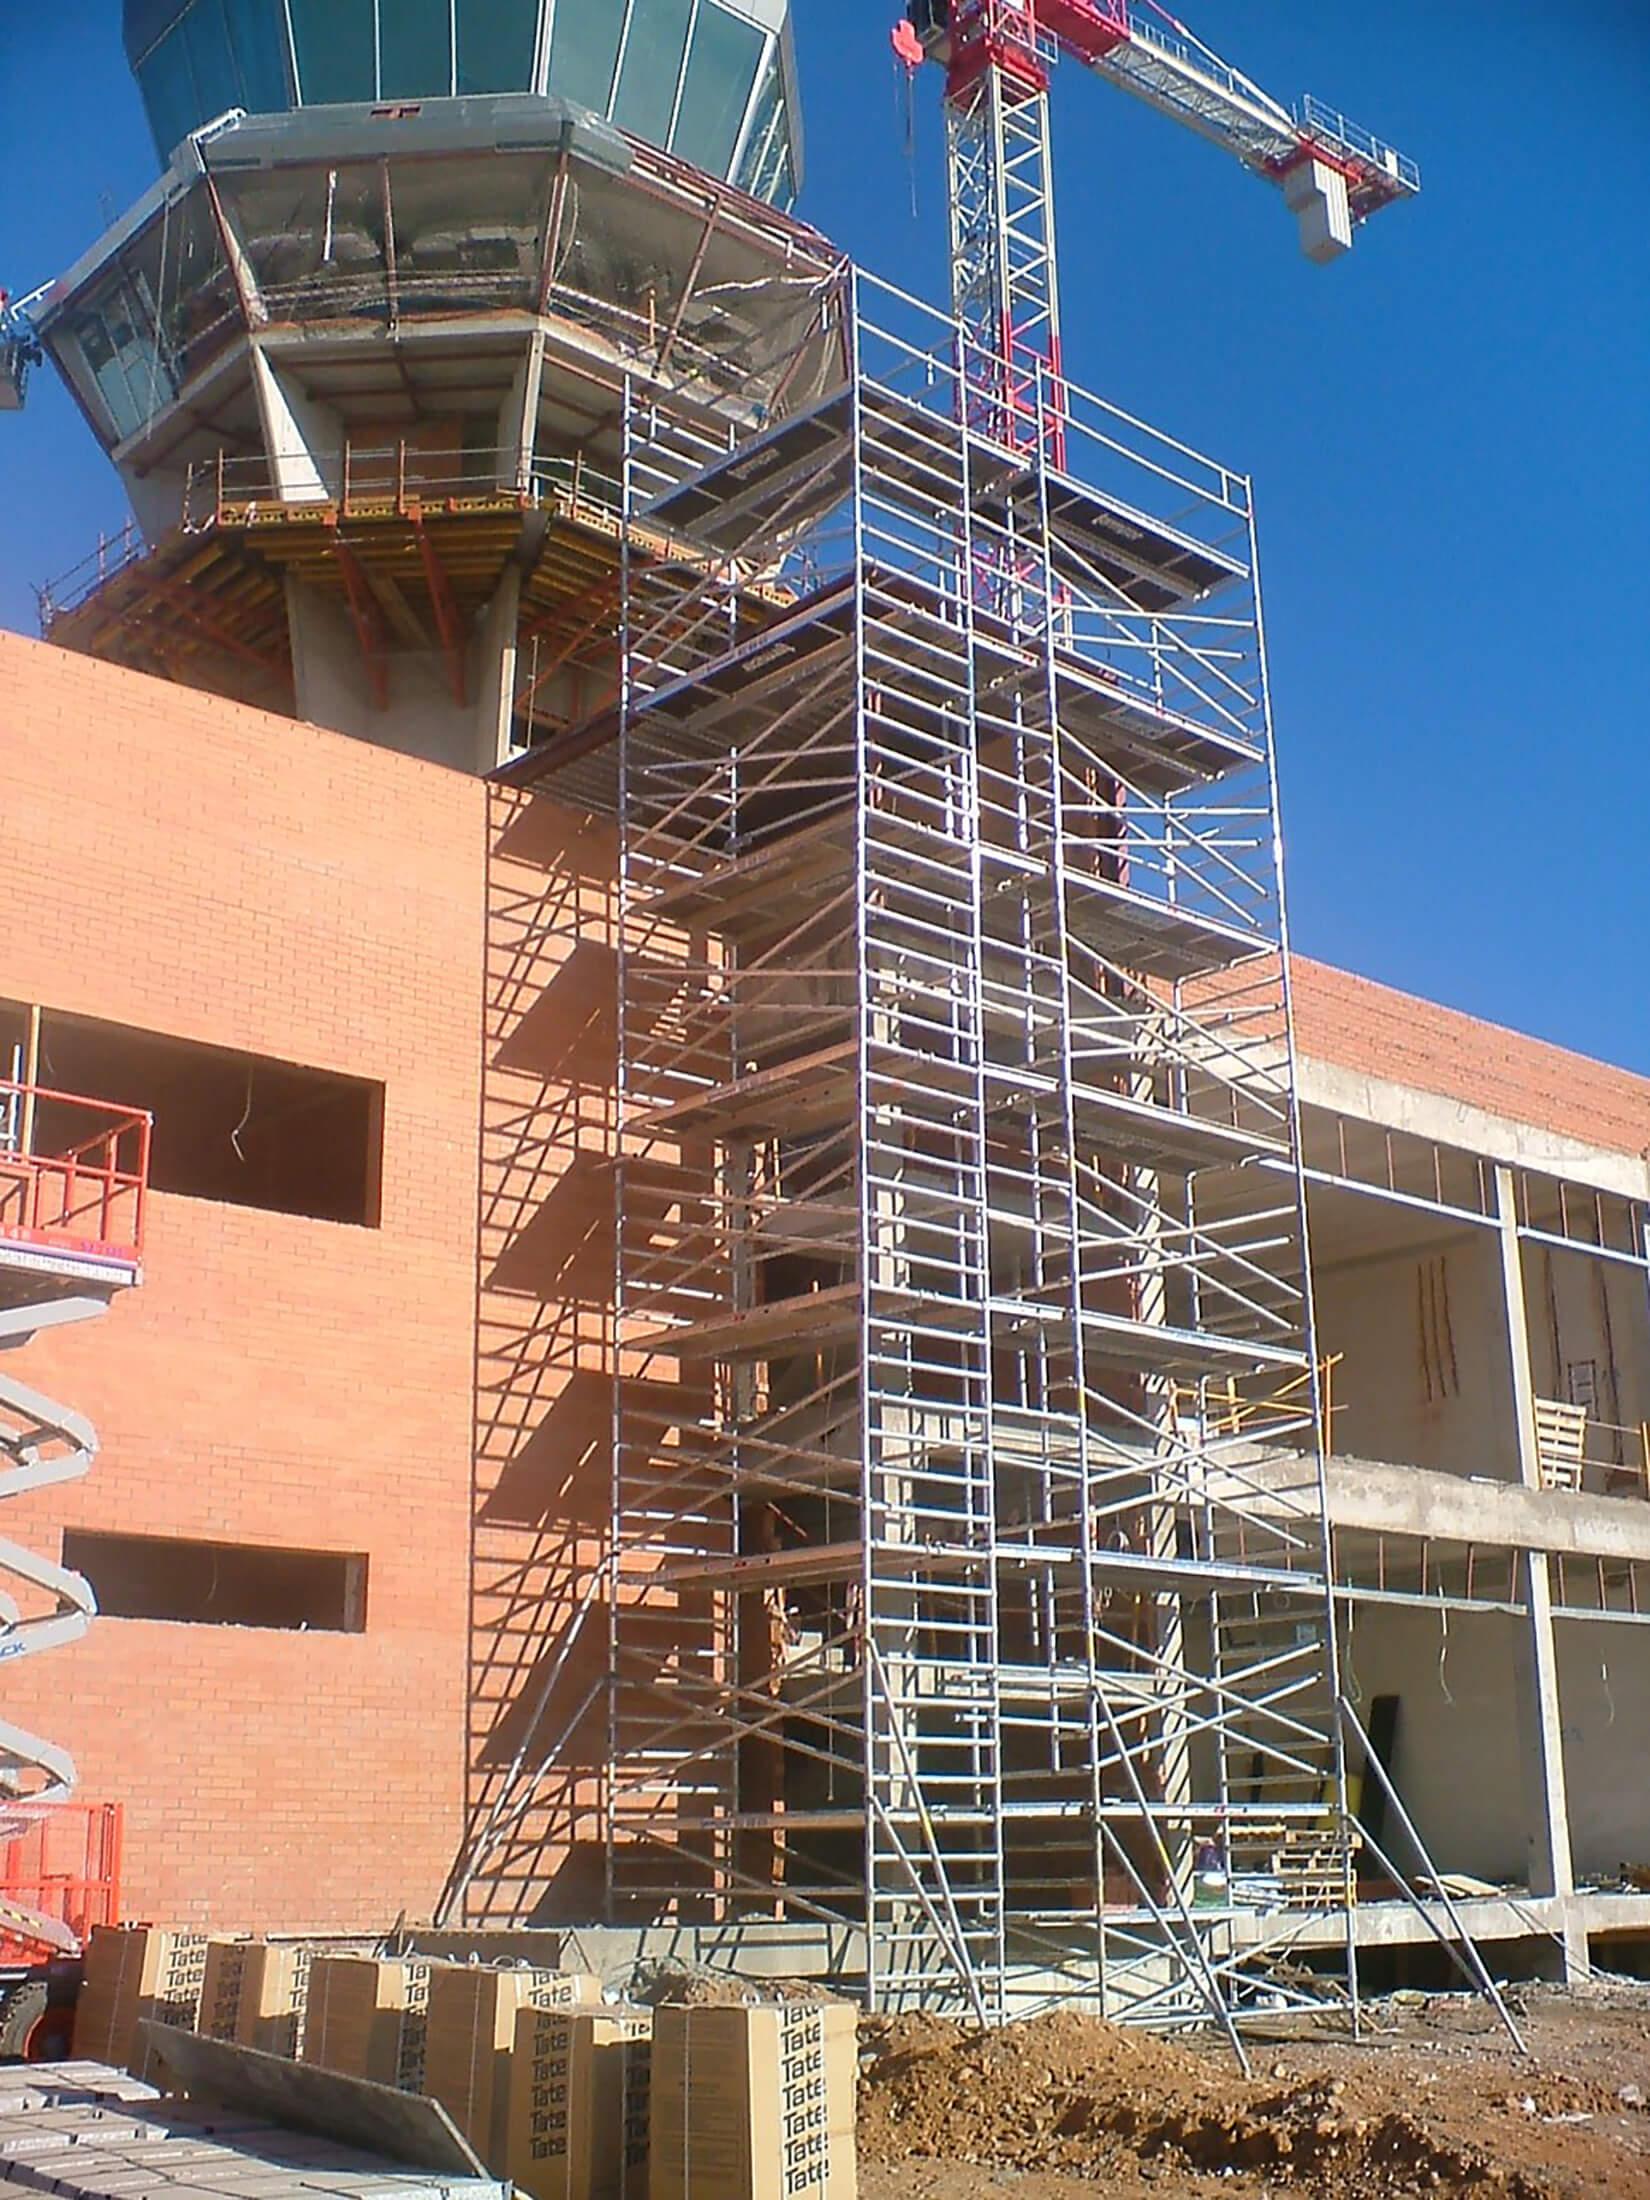 Scaffolding-Tower-03.jpg